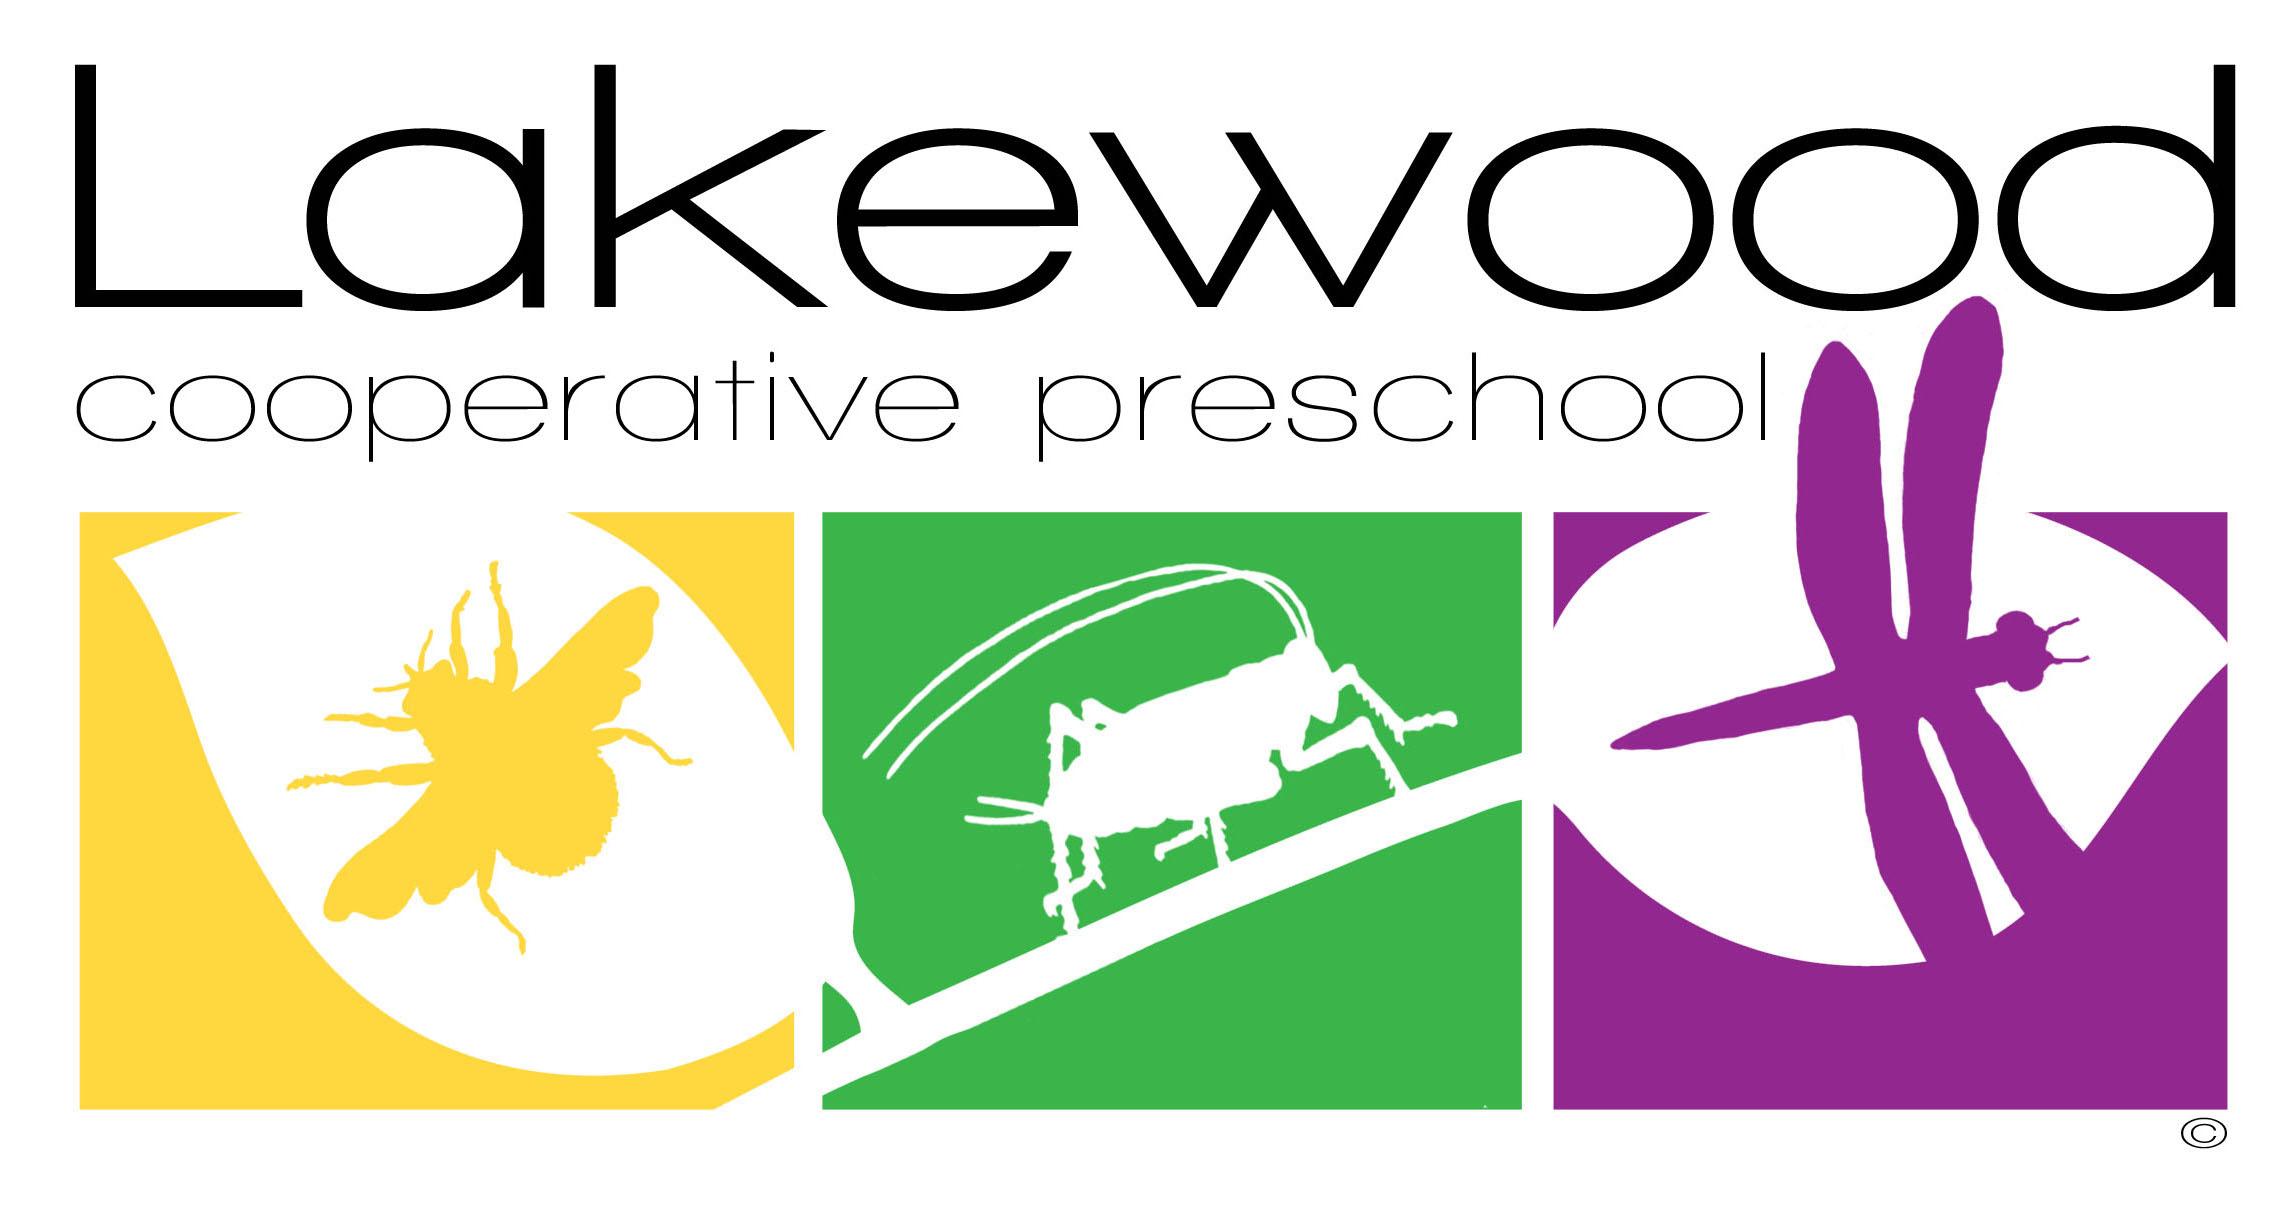 Lakewood Cooperative Preschool